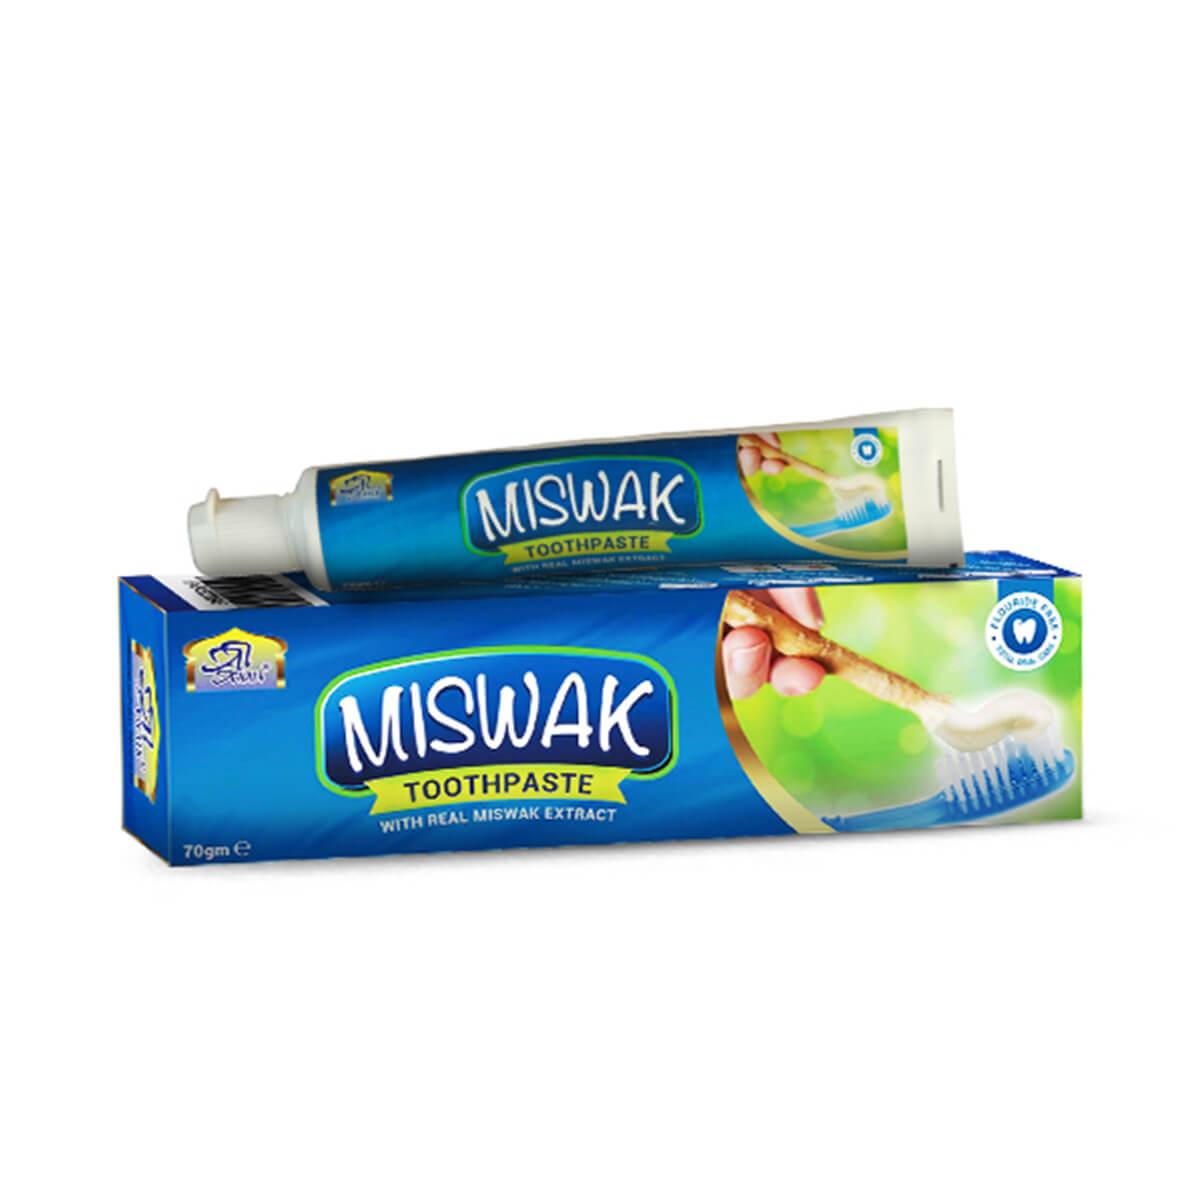 Miswak Toothpaste